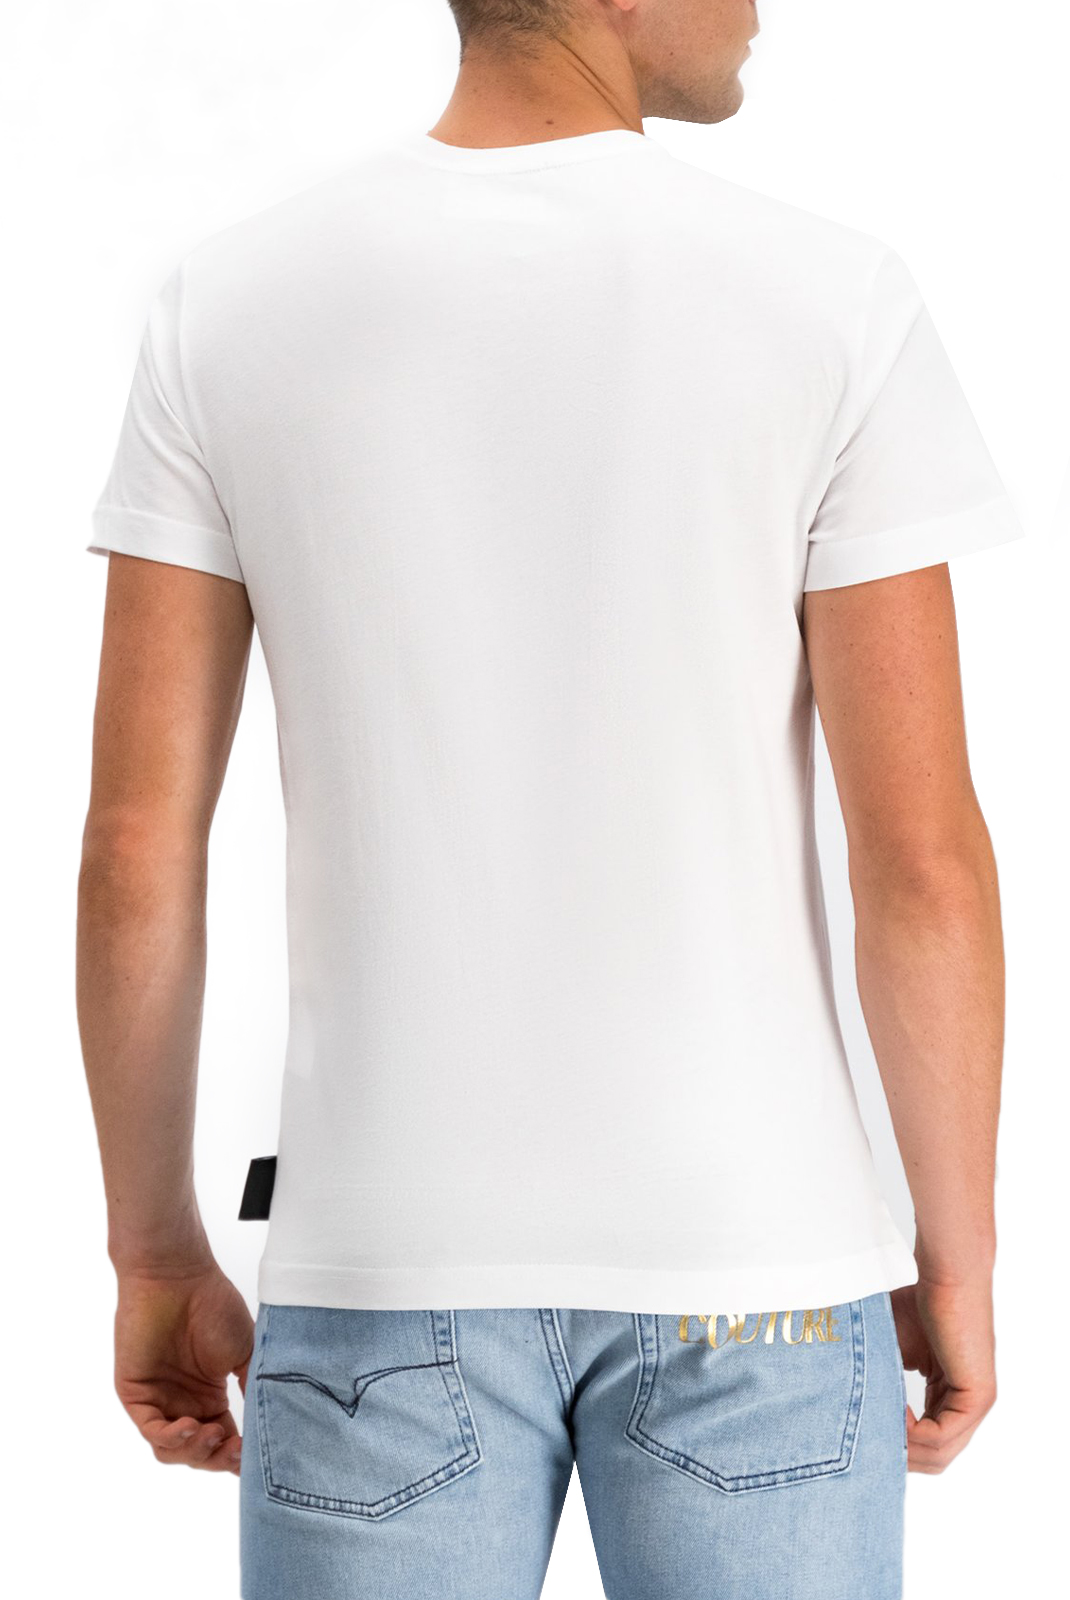 Tee-shirts  Versace Jeans B3GUA7EB ADRIANO WHITE